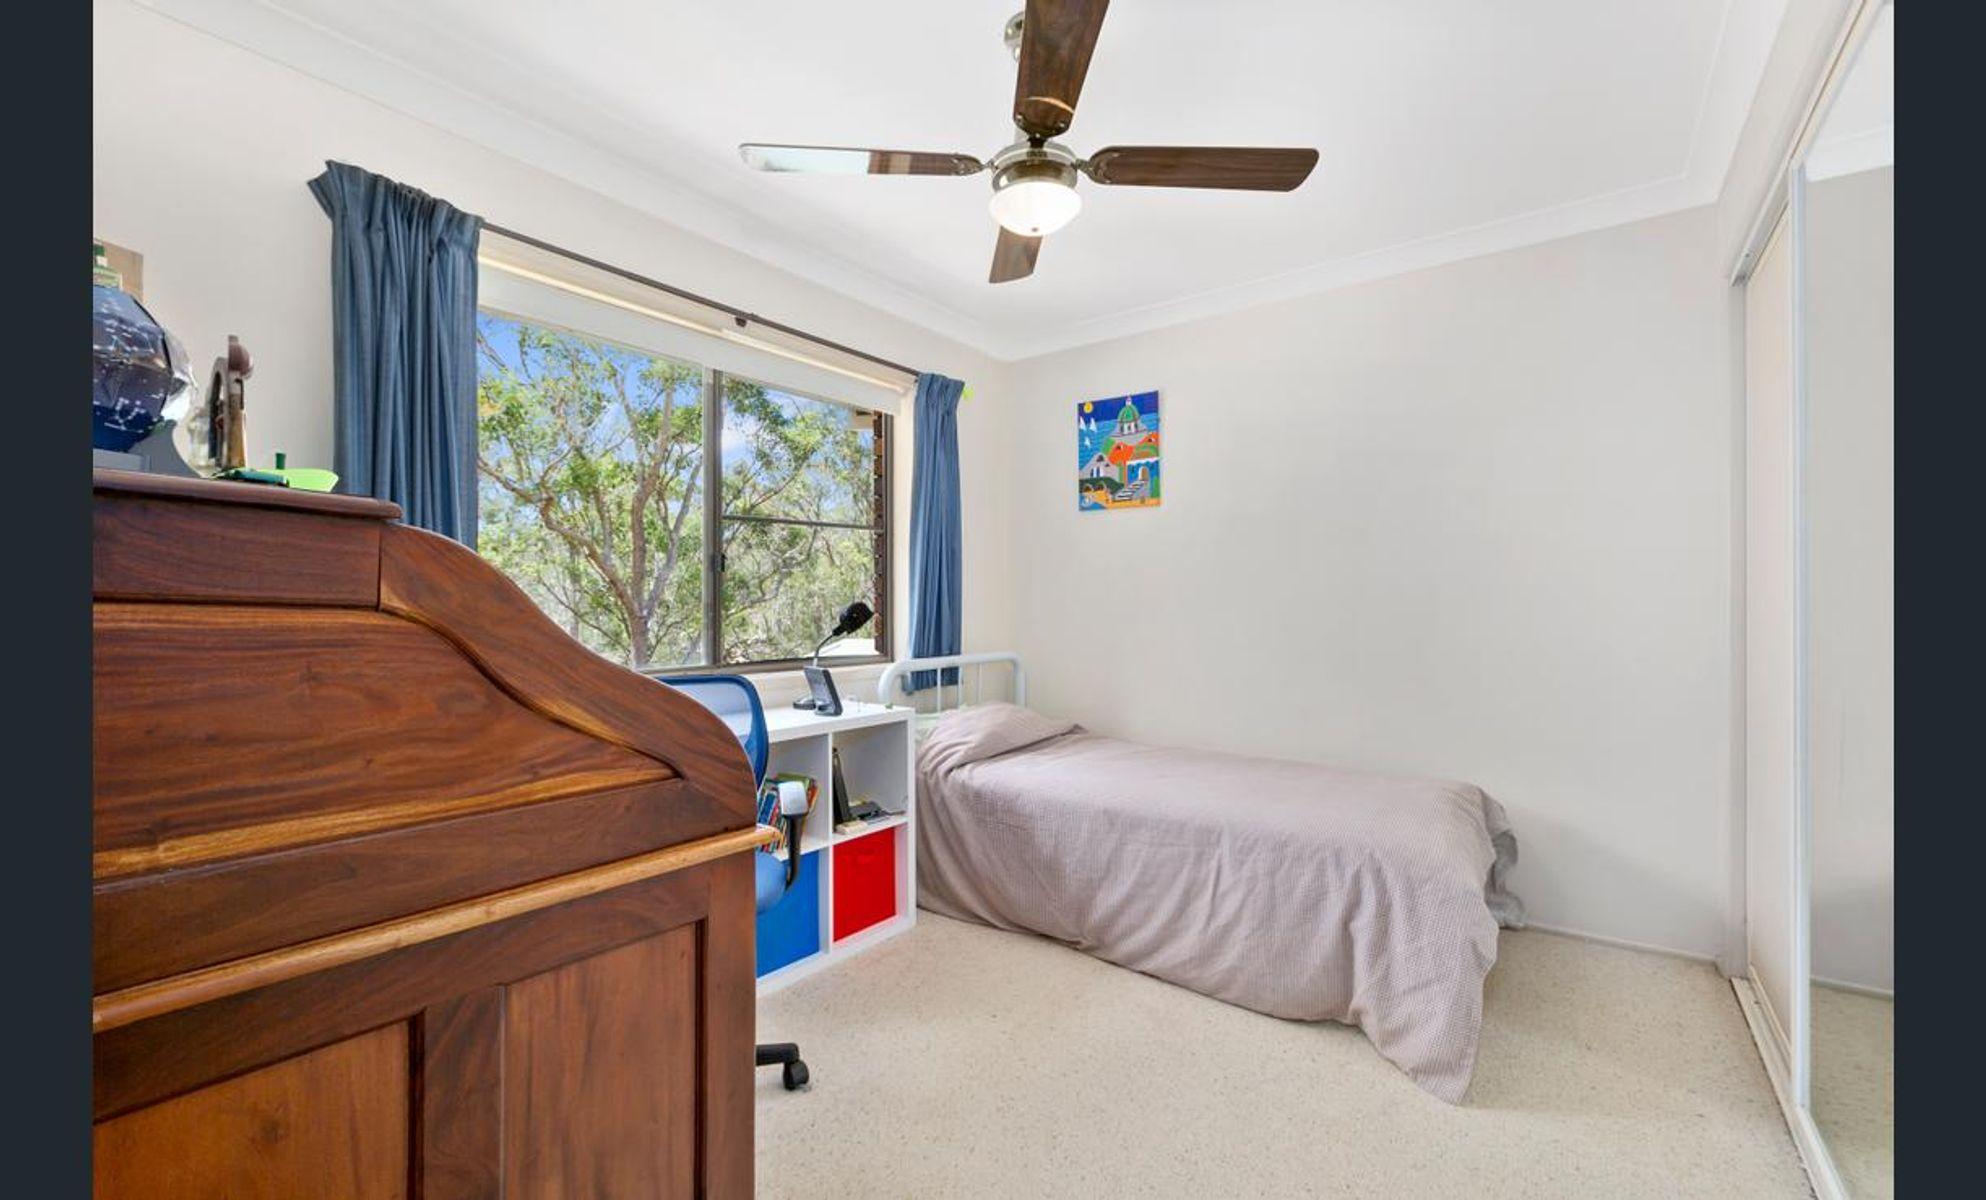 129 KLOSKE RD, Burbank, QLD 4156